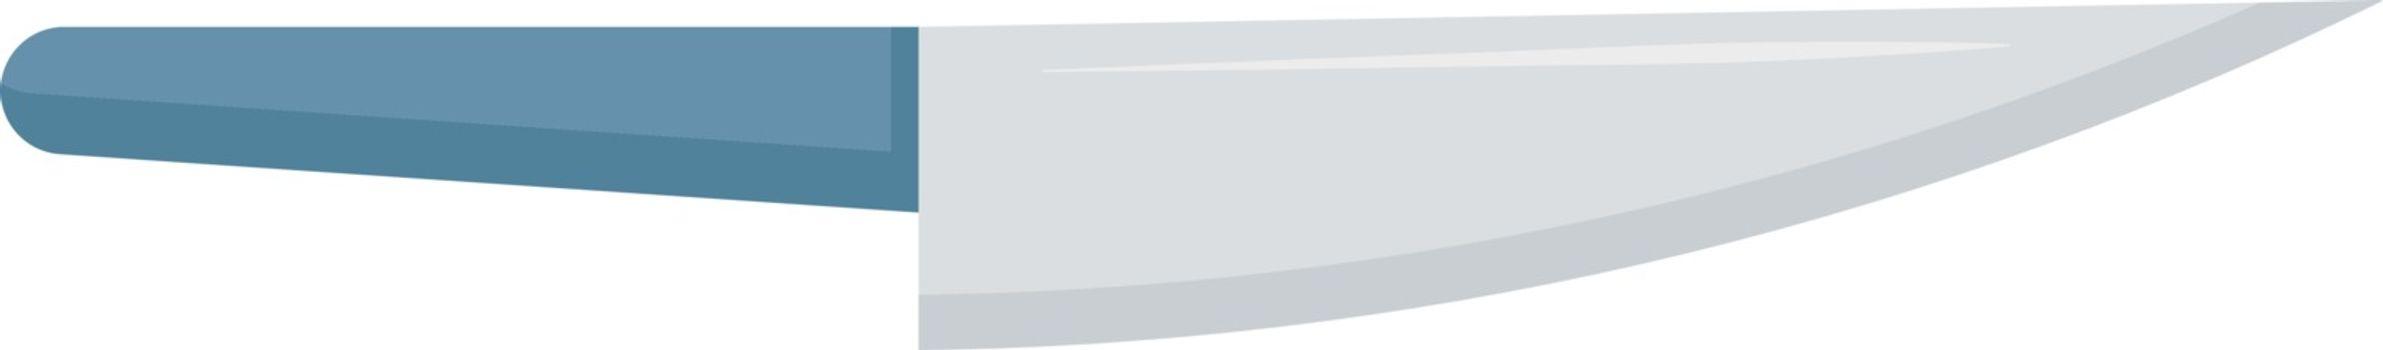 Knife, illustration, vector on white background.